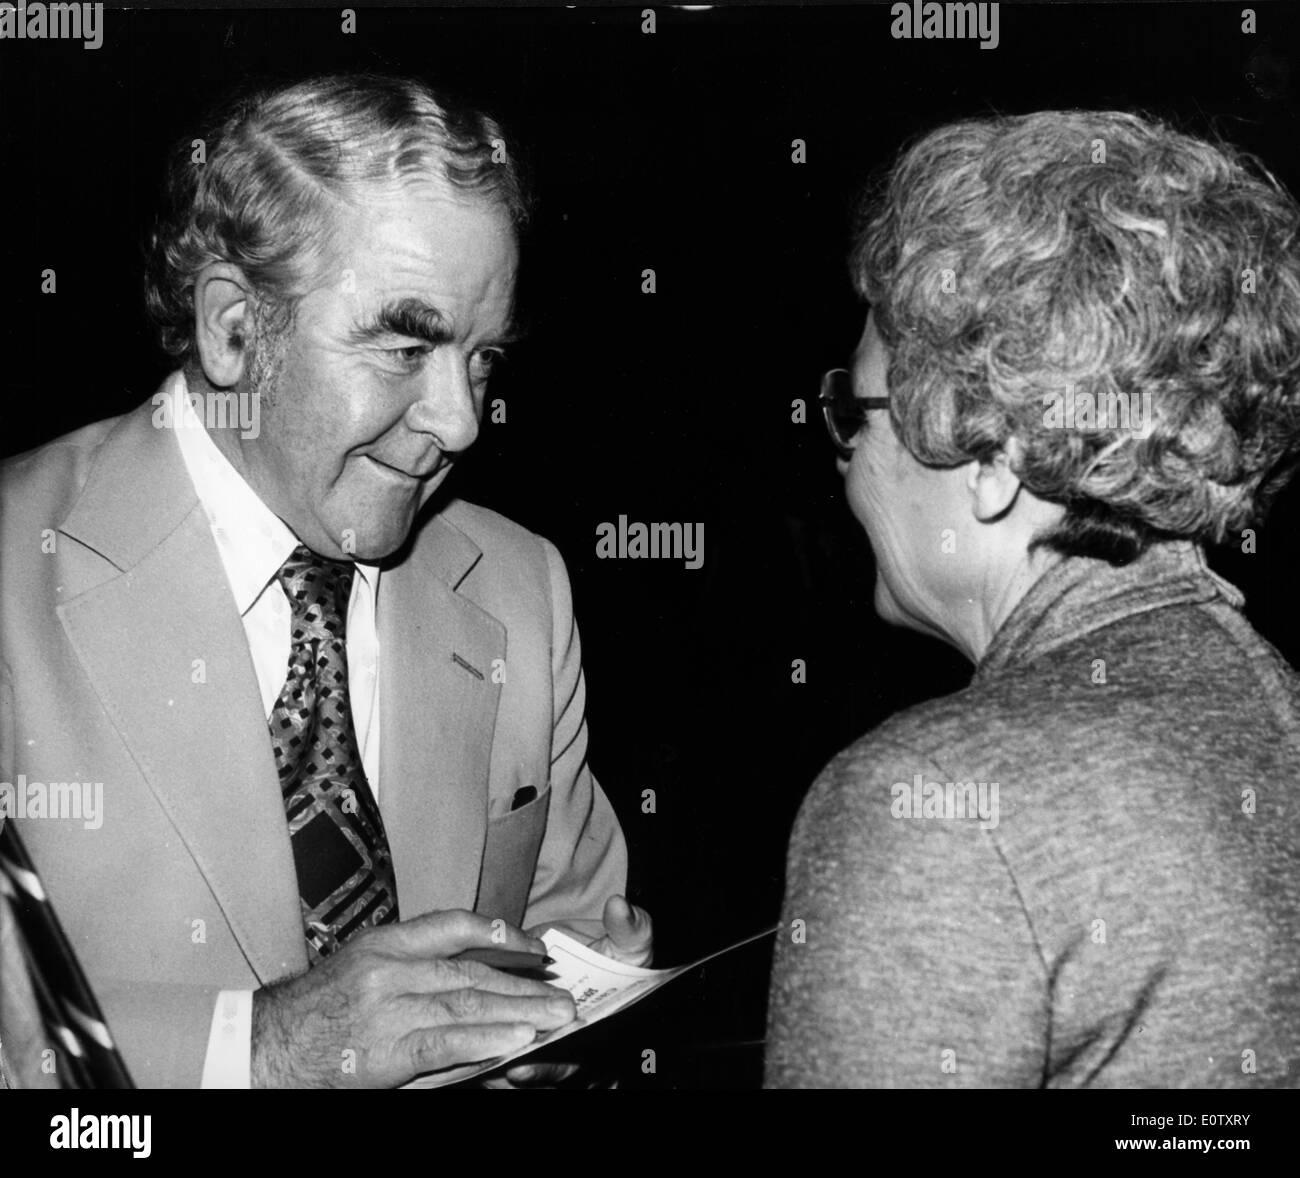 Joe Gormley signs an autograph for a woman - Stock Image